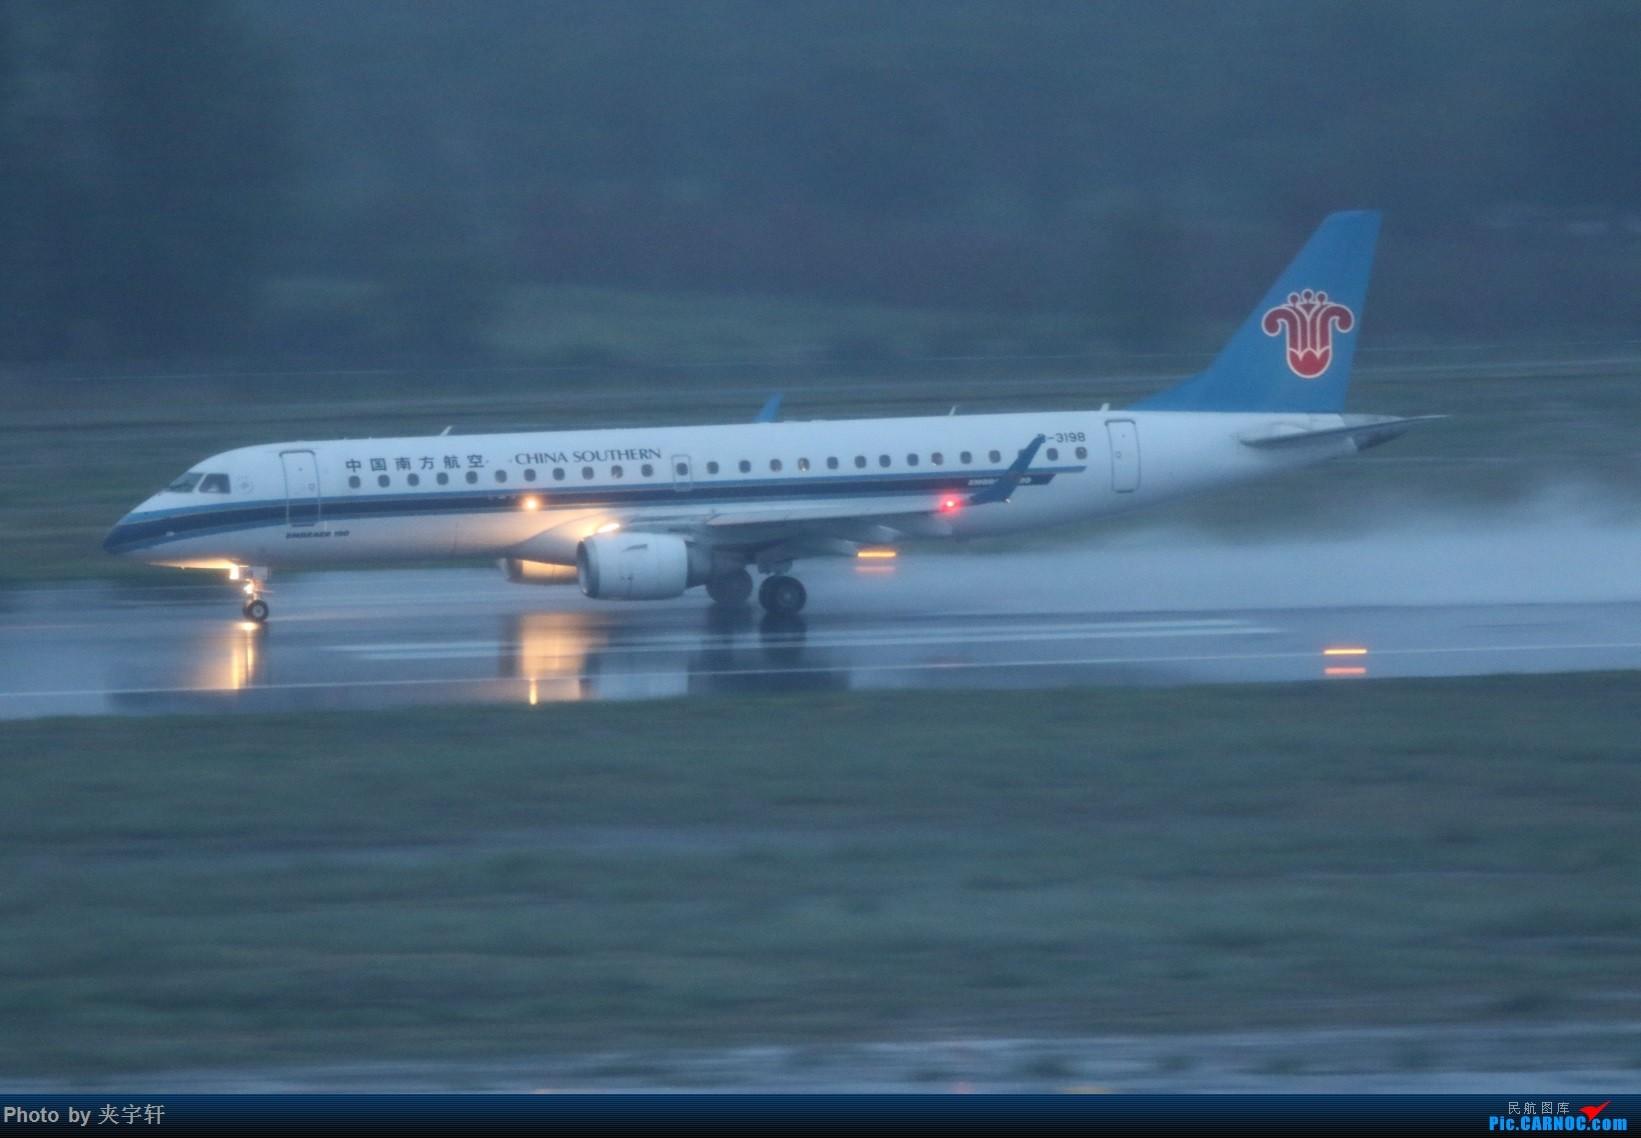 Re:[原创]【URC】雨天动图!+吹水 EMBRAER E-190 B-3198 中国乌鲁木齐地窝堡国际机场